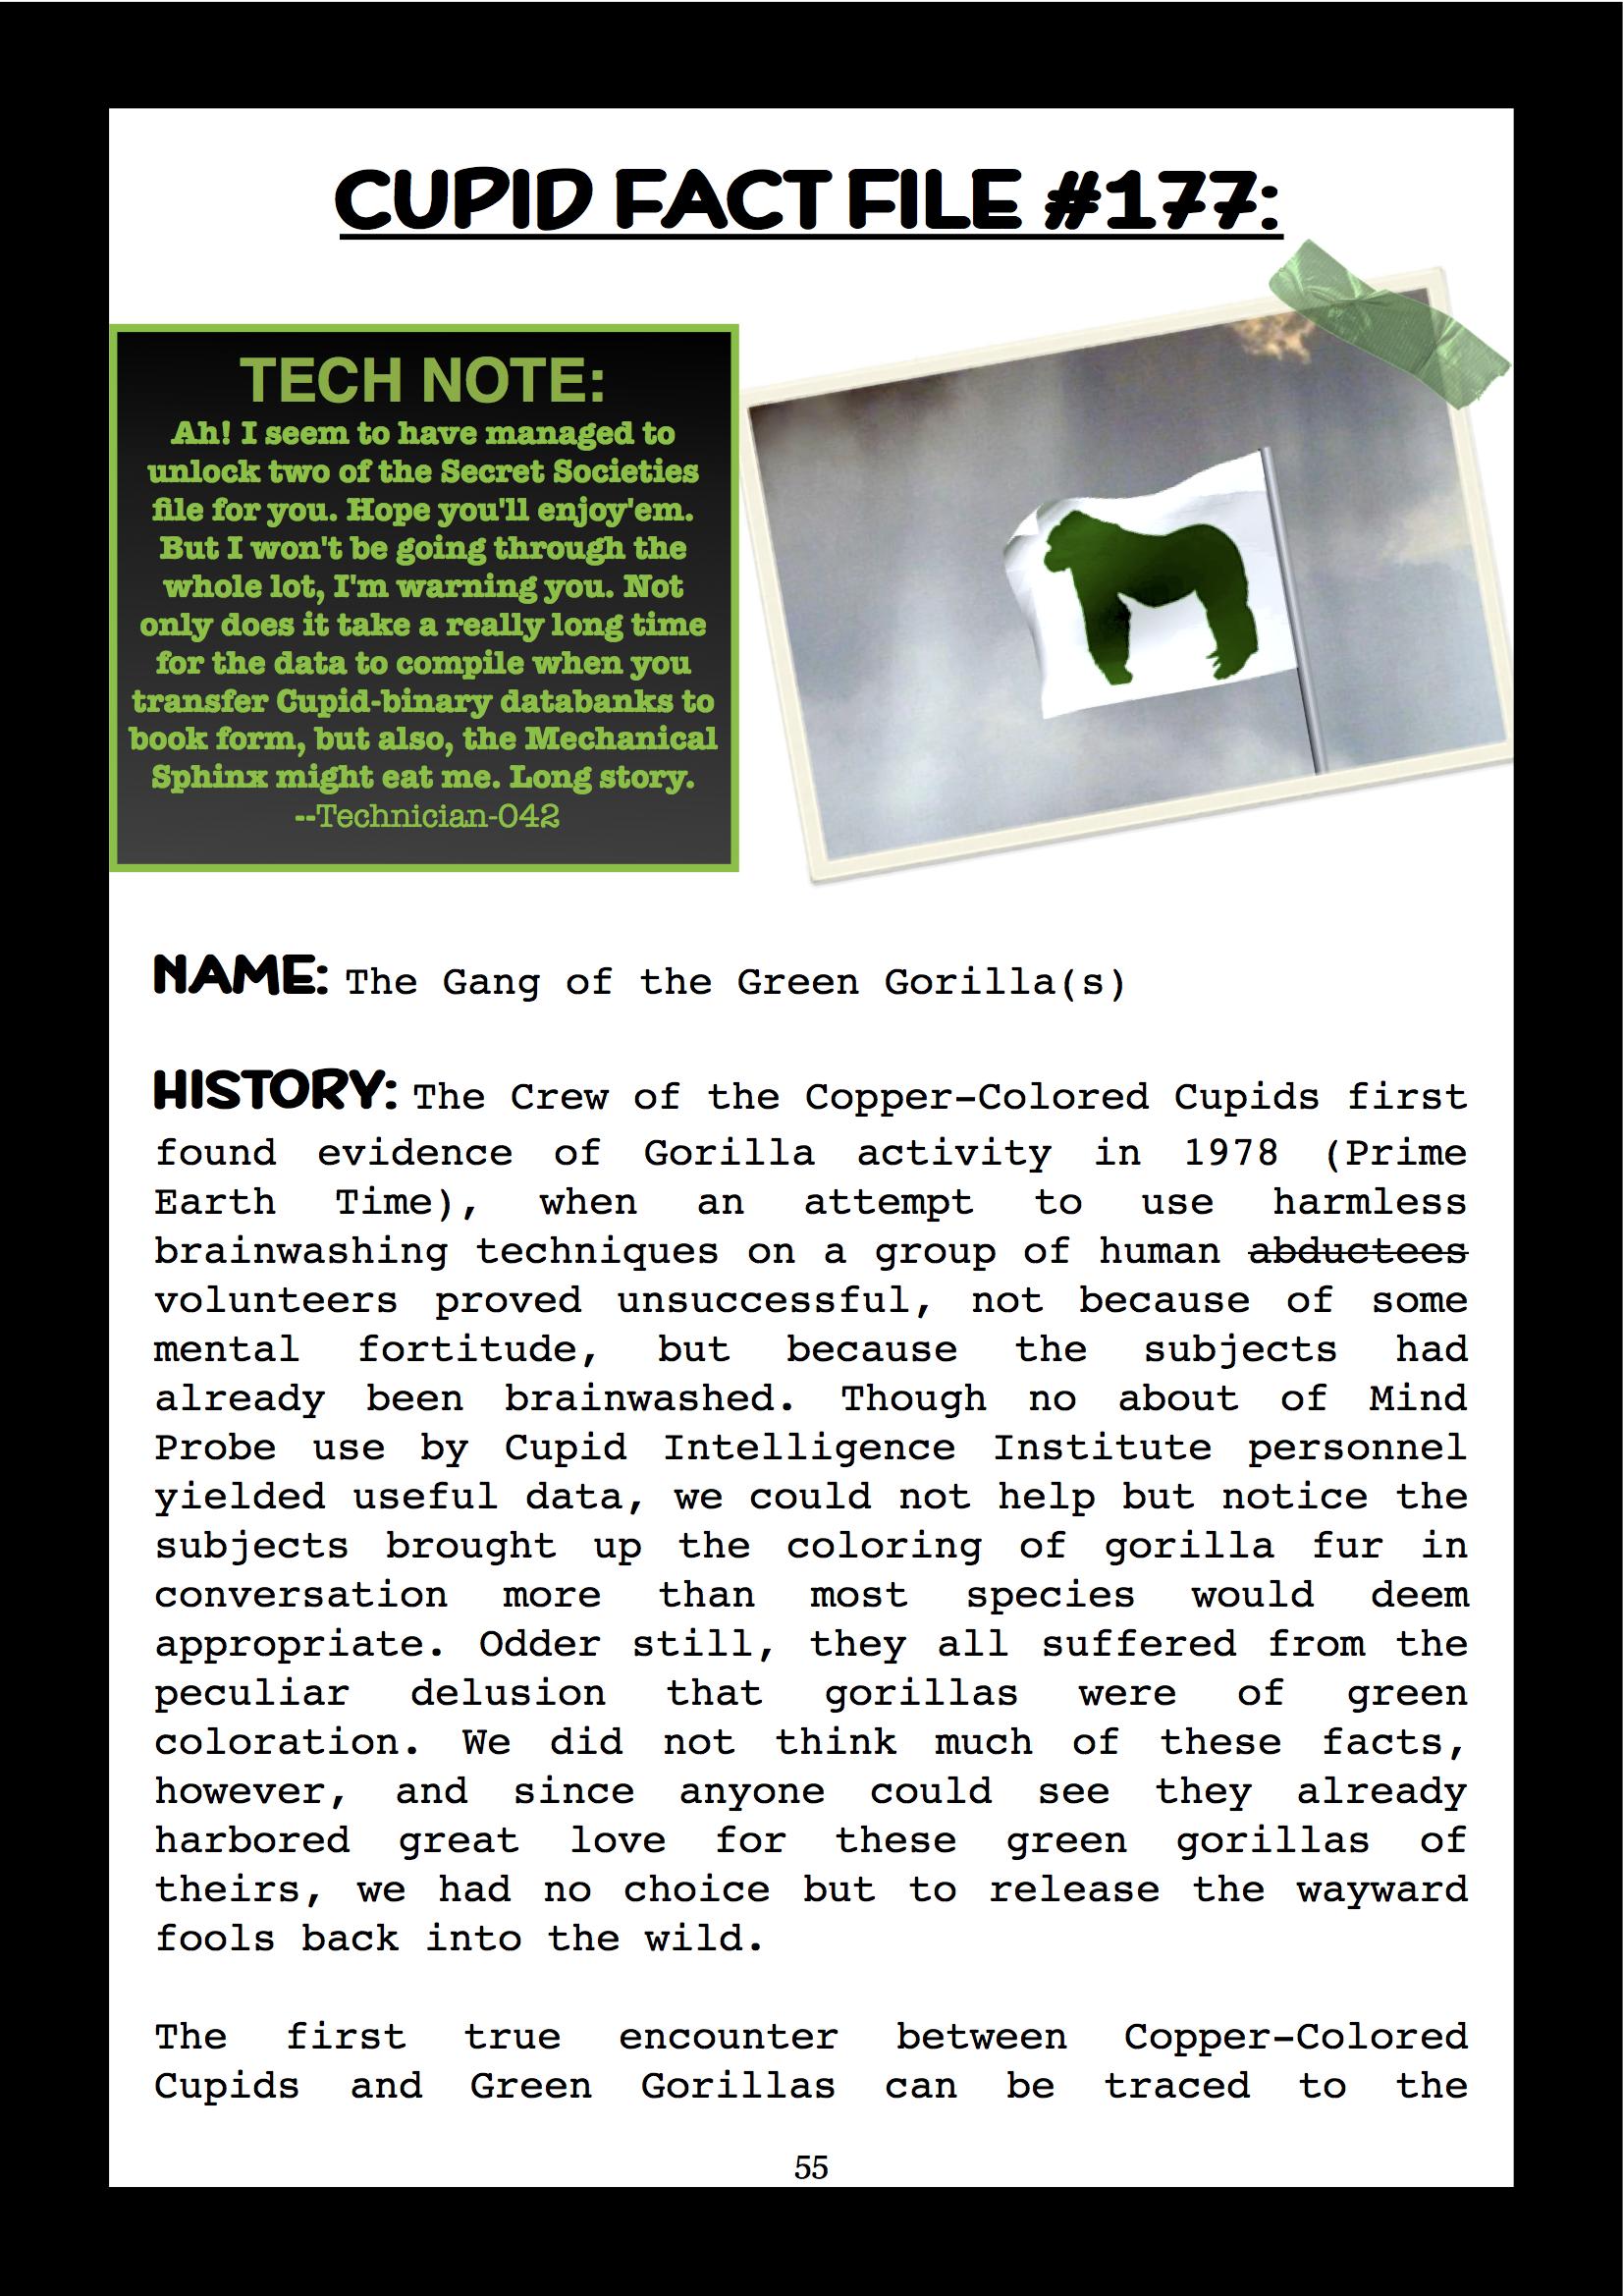 Cupid Fact File No. 177 — The Green Gorillas